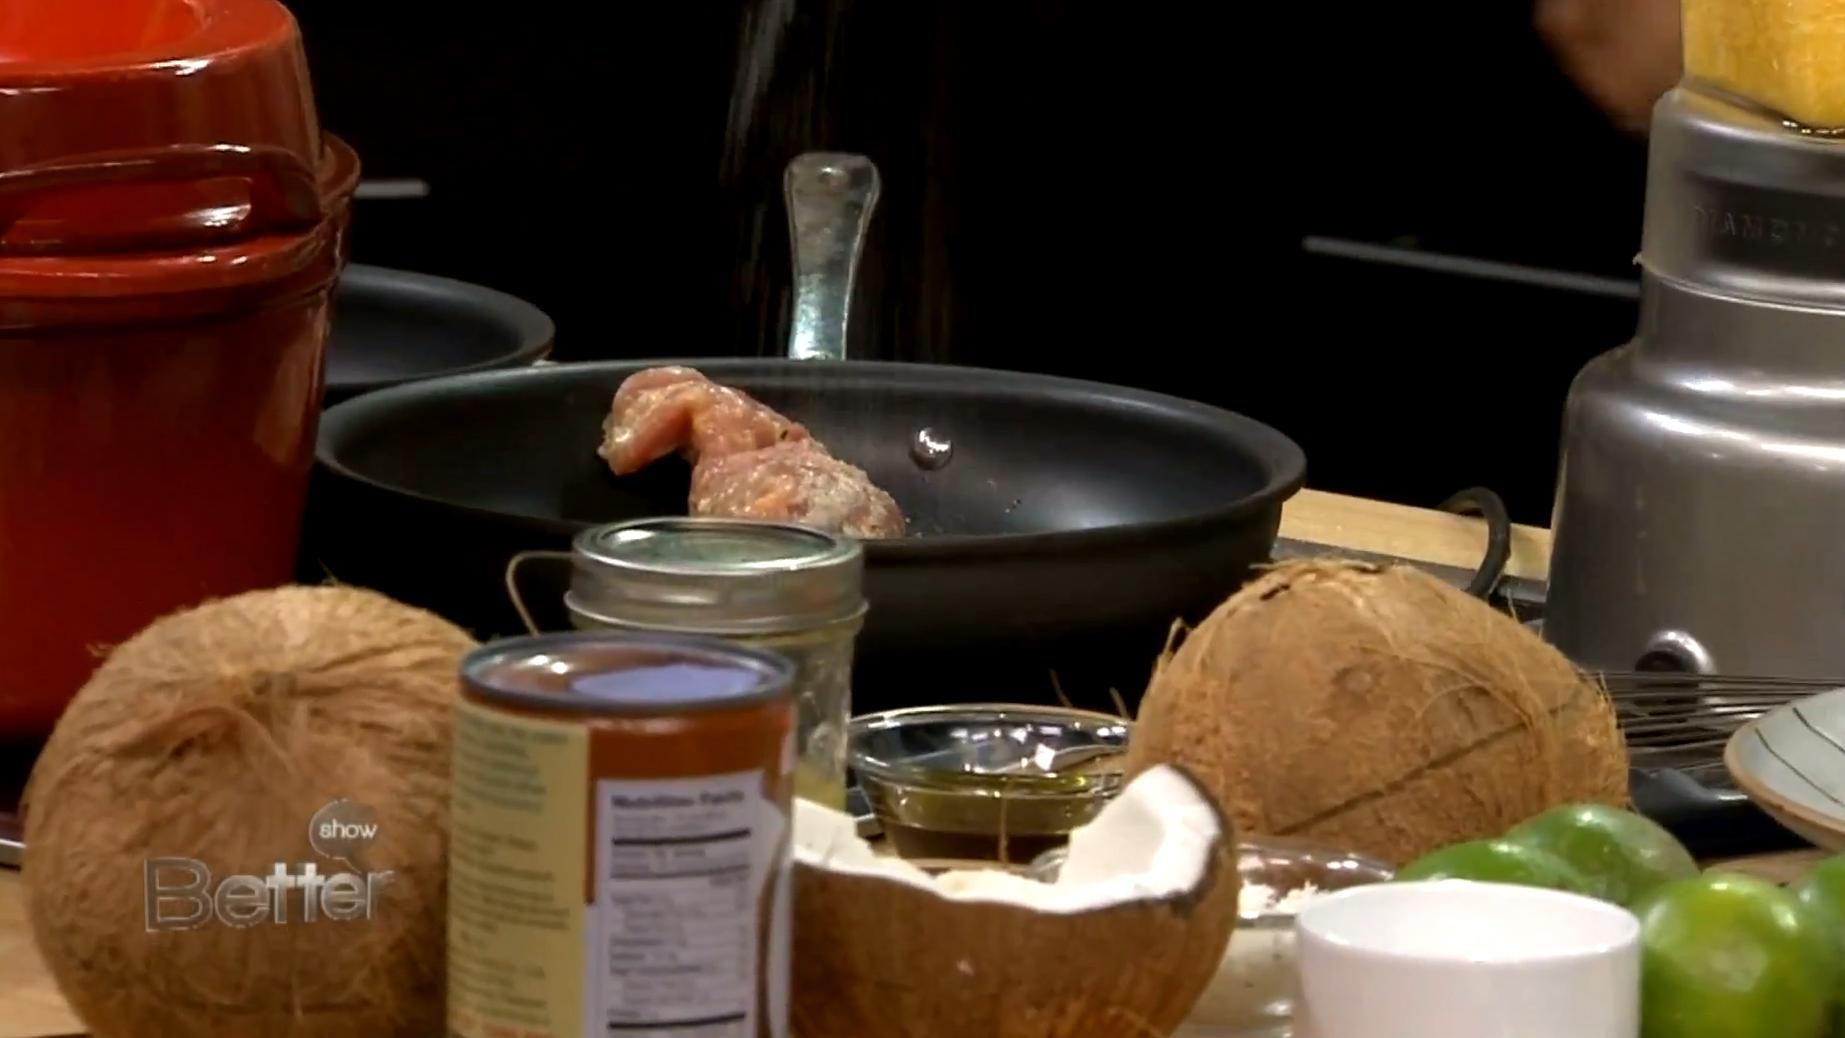 Chef Ronaldo Linares' Citrus Marinade Pork Tenderloin Recipe